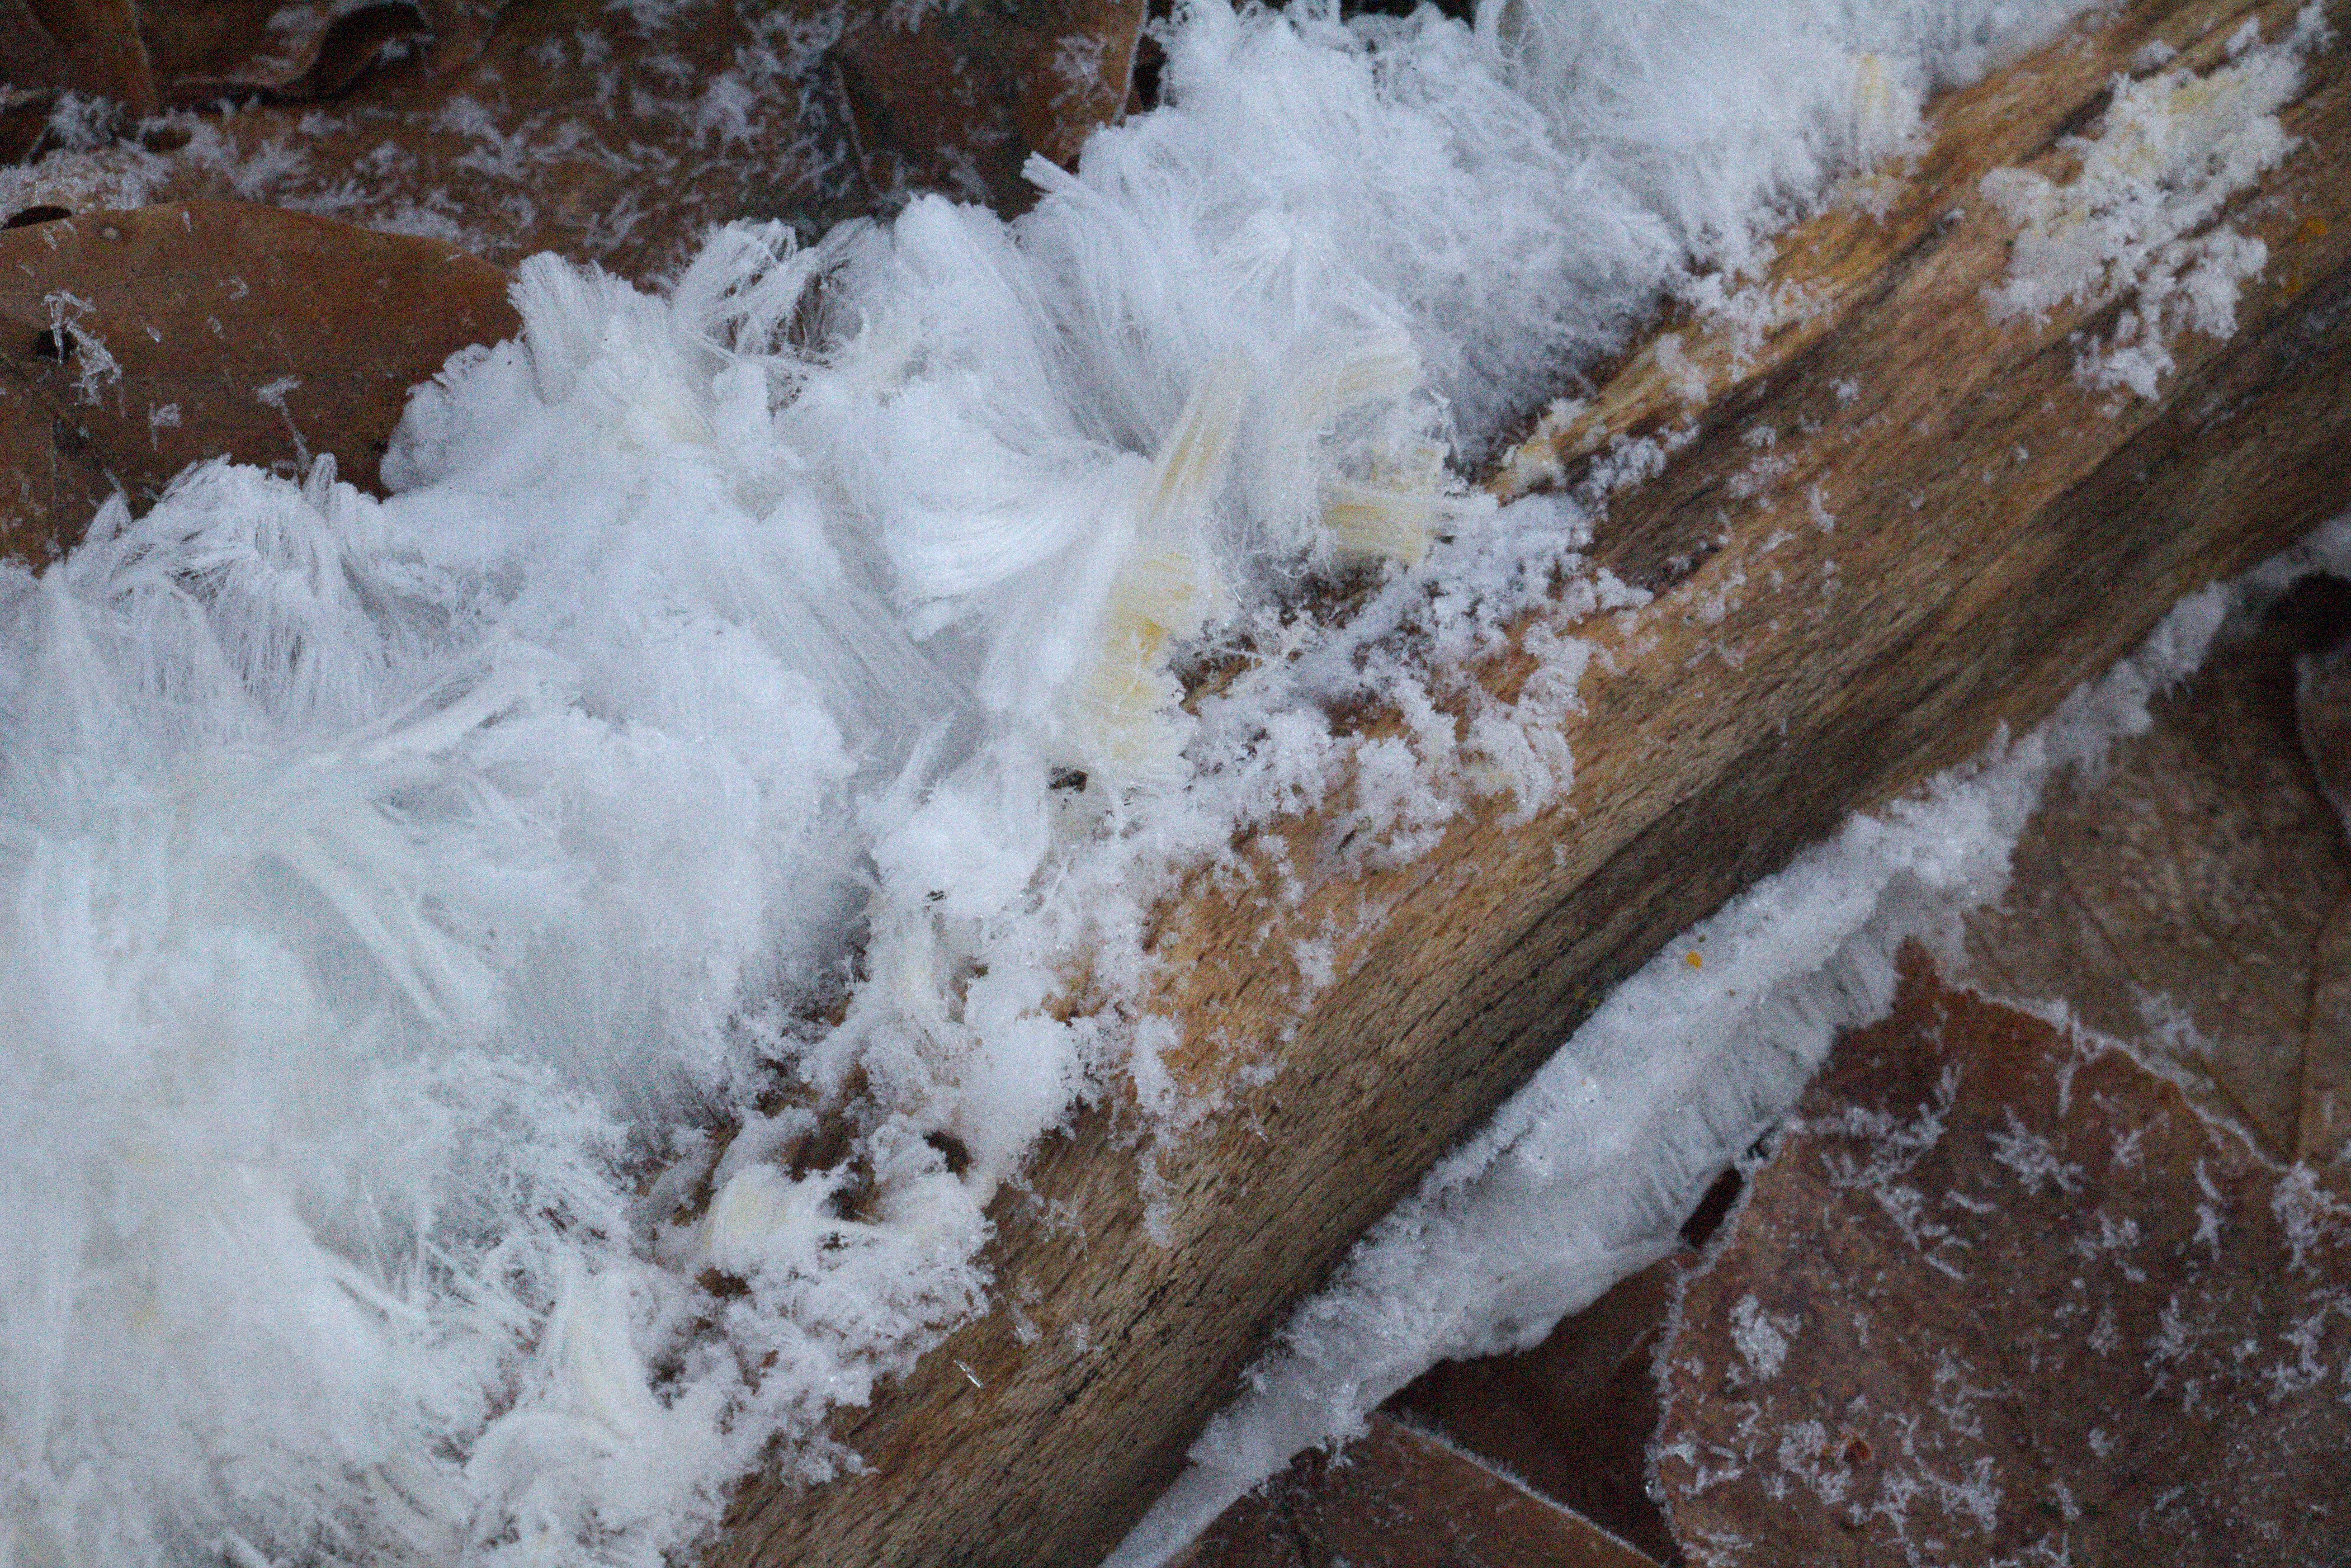 File:Gersfeld Kl Nalle Hairice Wood Fagus b.png - PNG Nalle